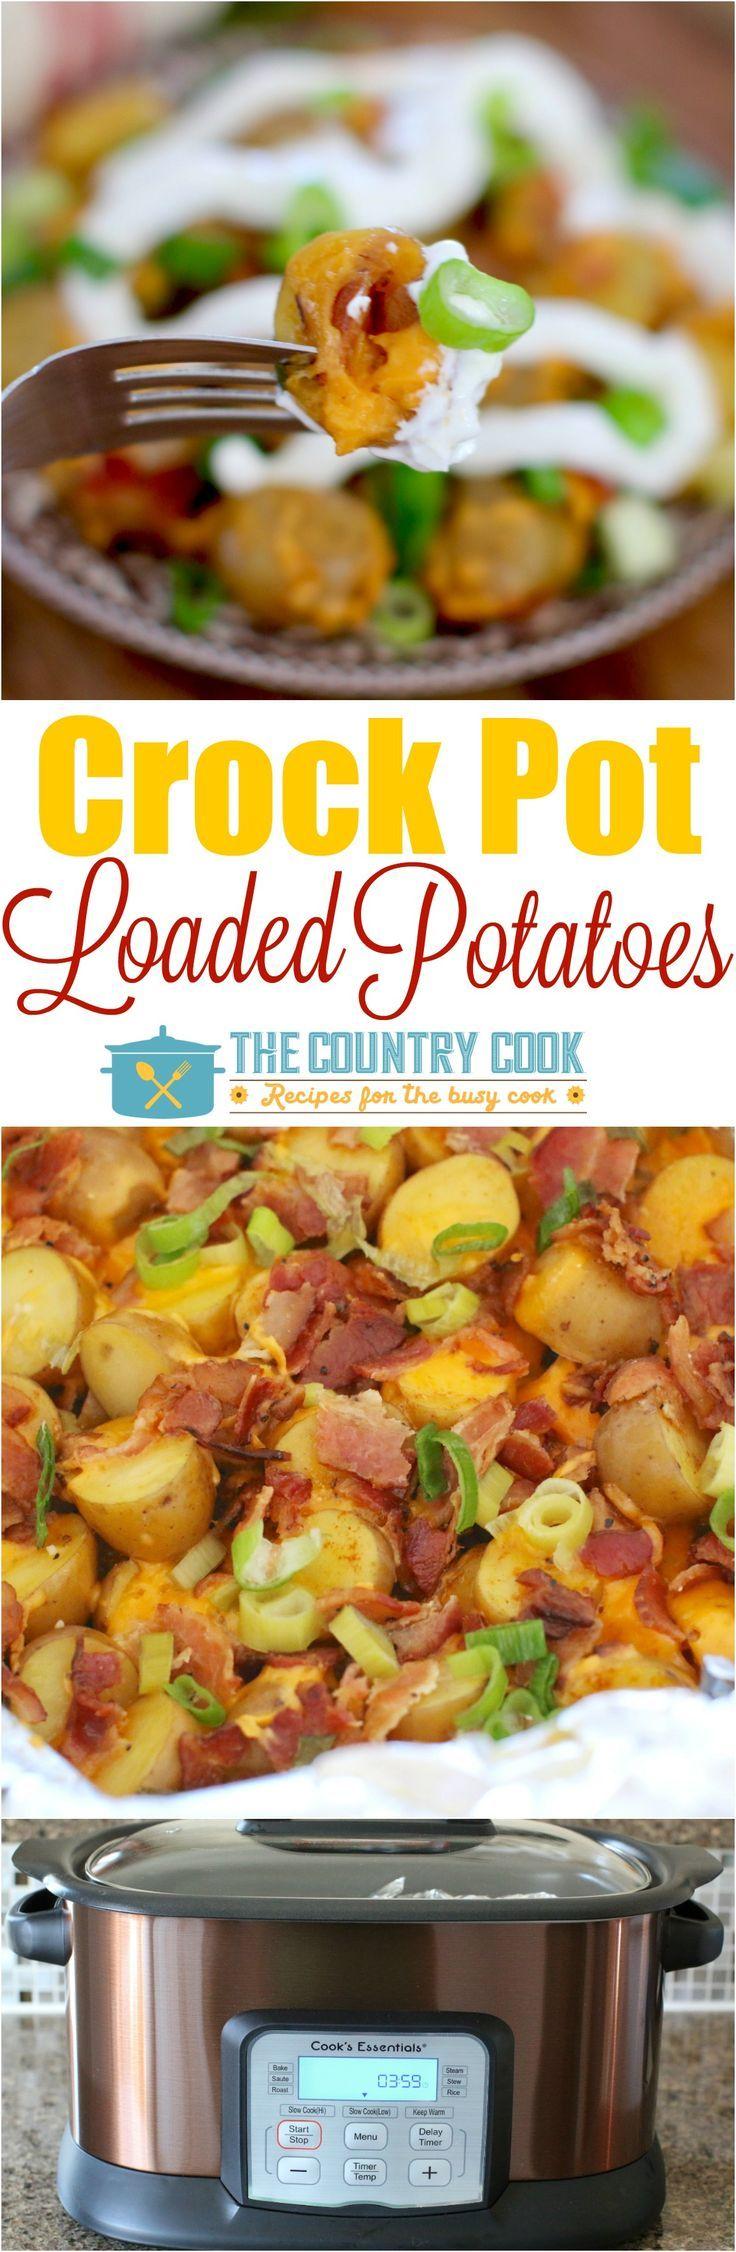 100 crock pot recipes on pinterest crock pot crockpot. Black Bedroom Furniture Sets. Home Design Ideas